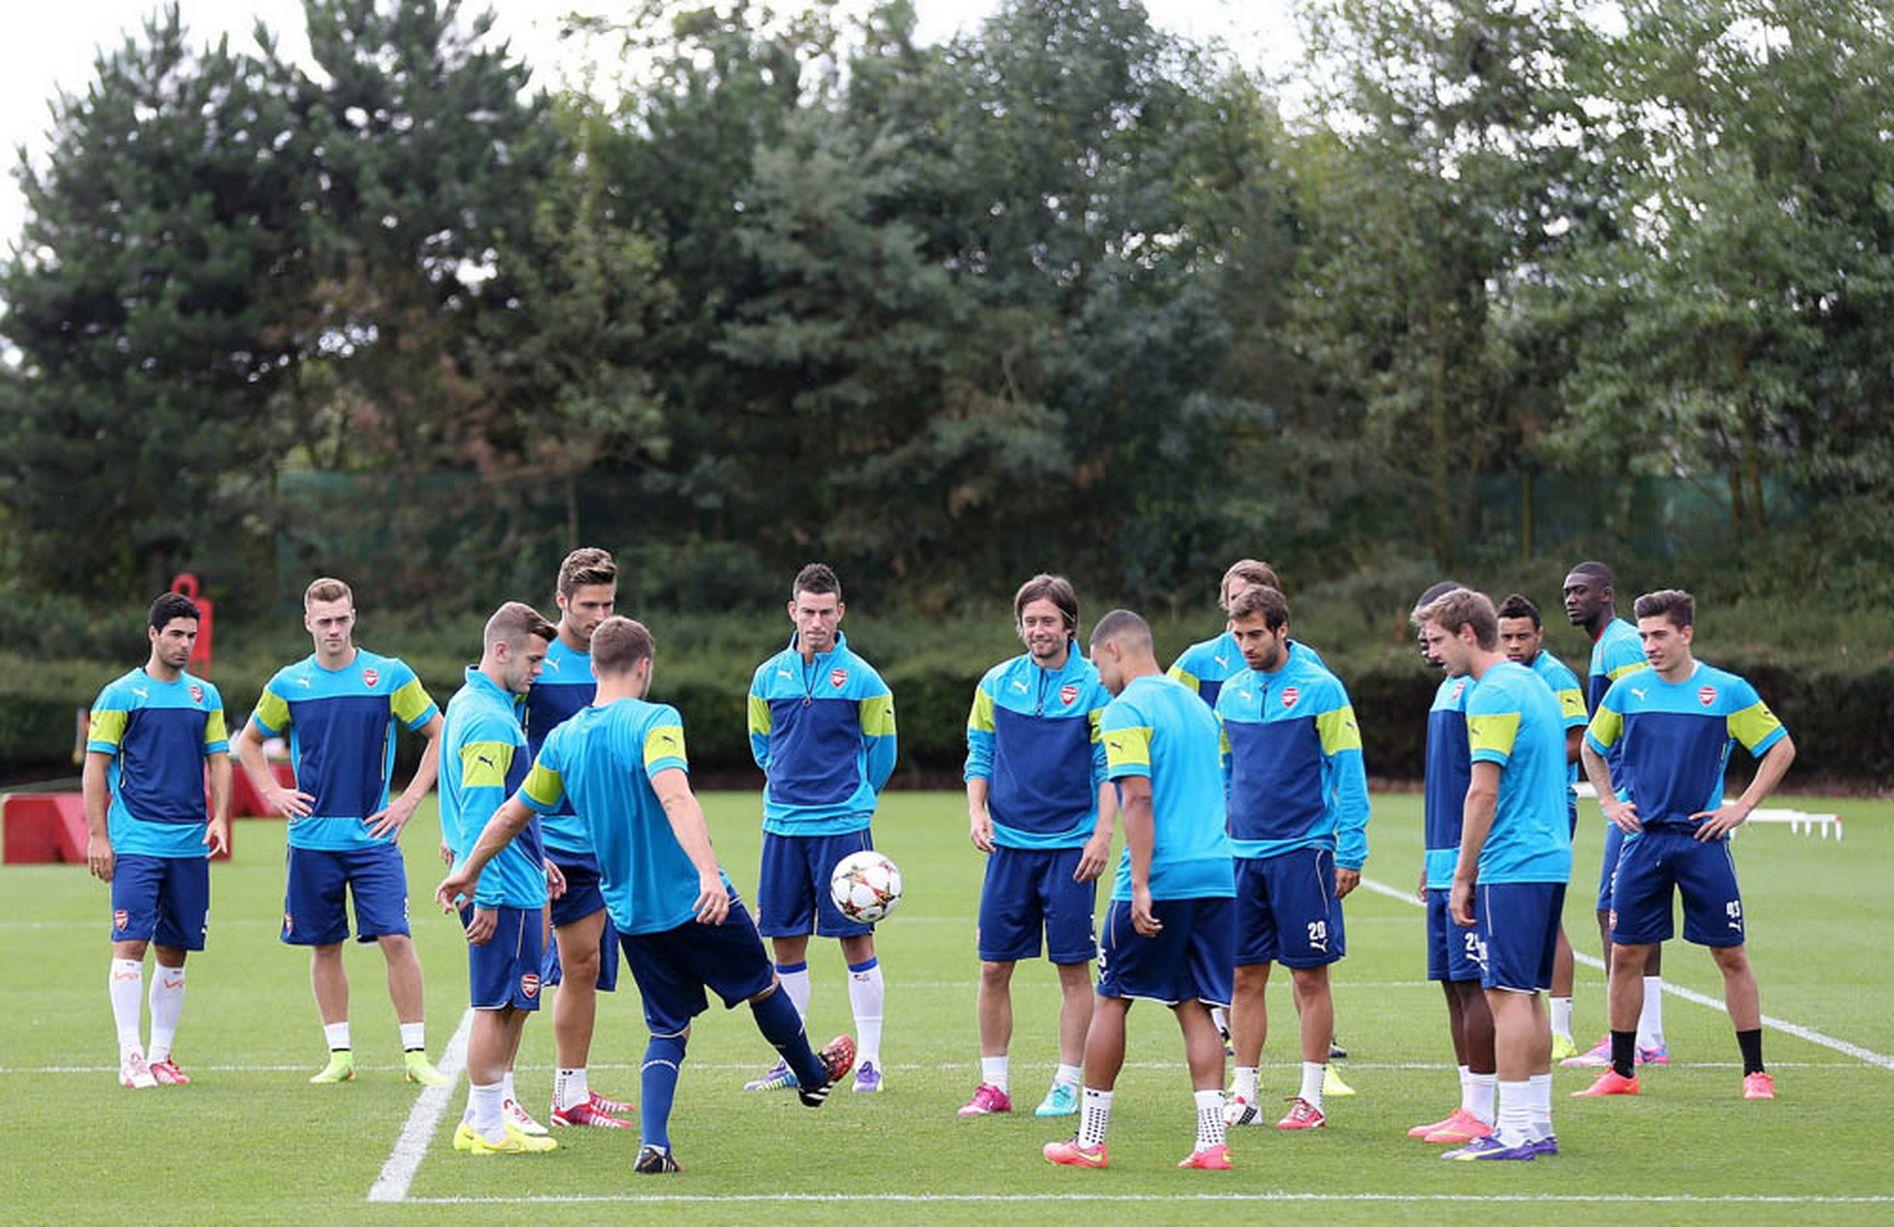 Arsenal-Training-Pics 3